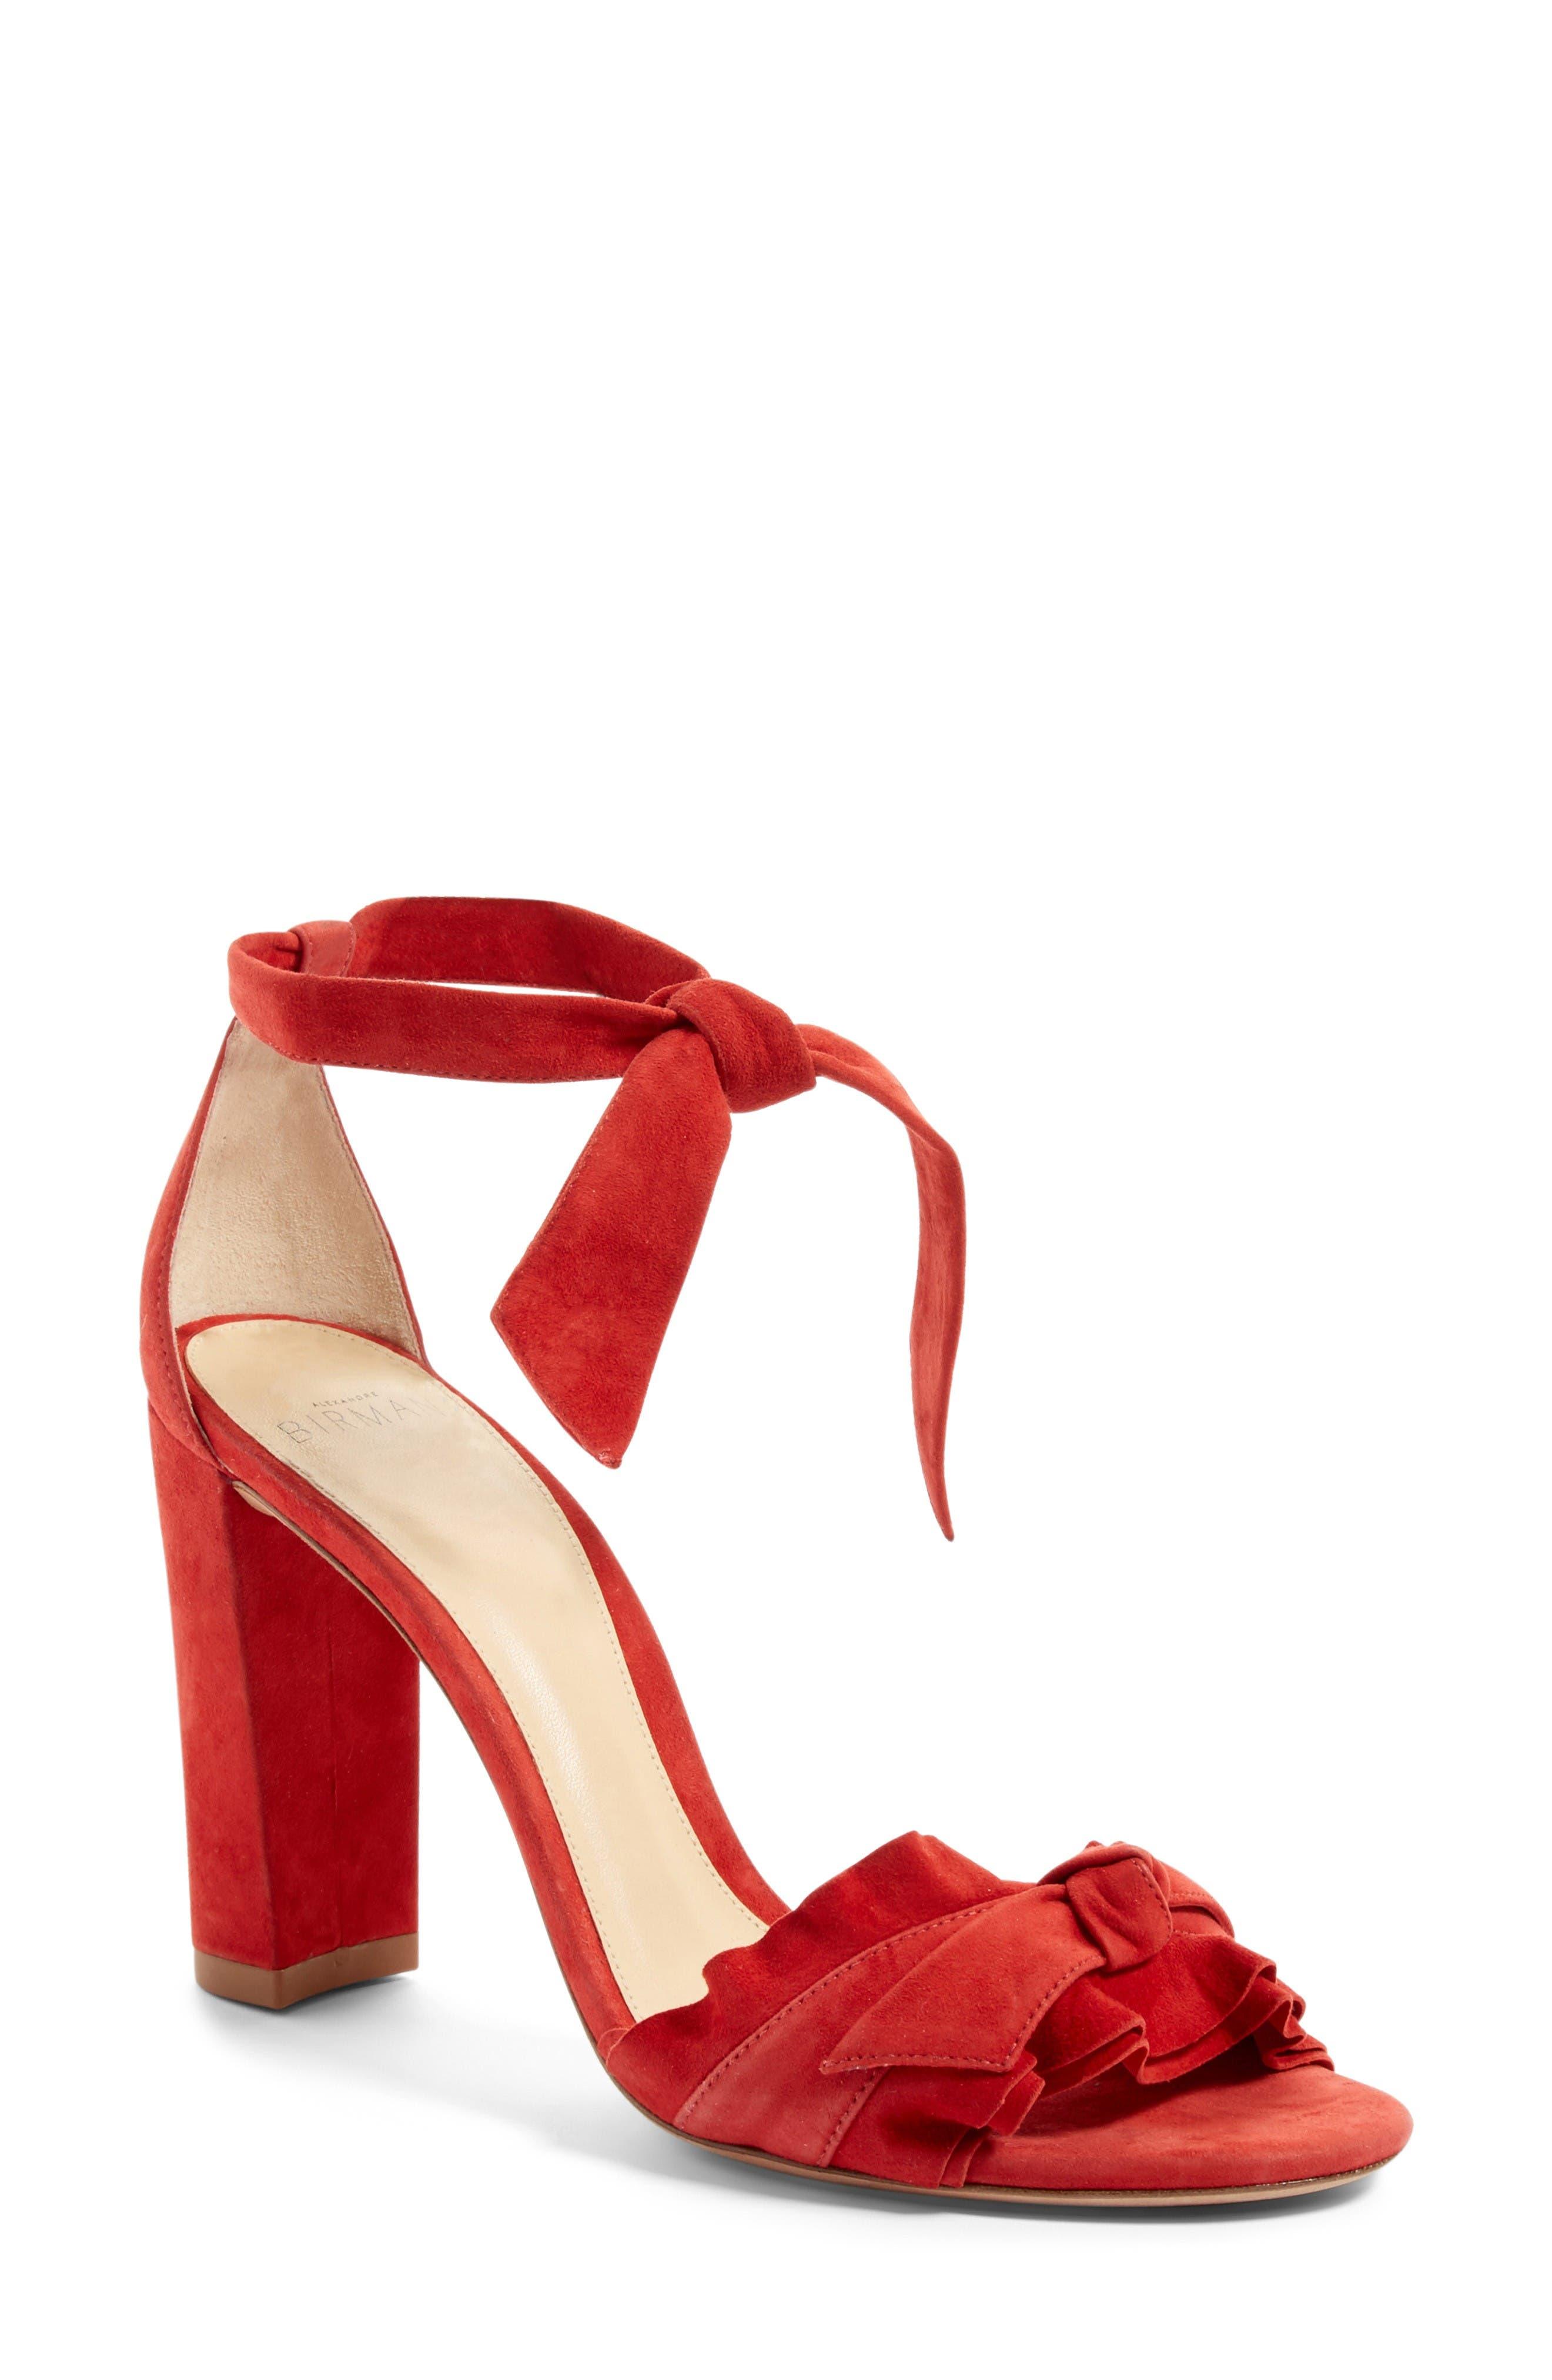 Alternate Image 1 Selected - Alexandre Birman Lupita Block Heel Sandal (Women)